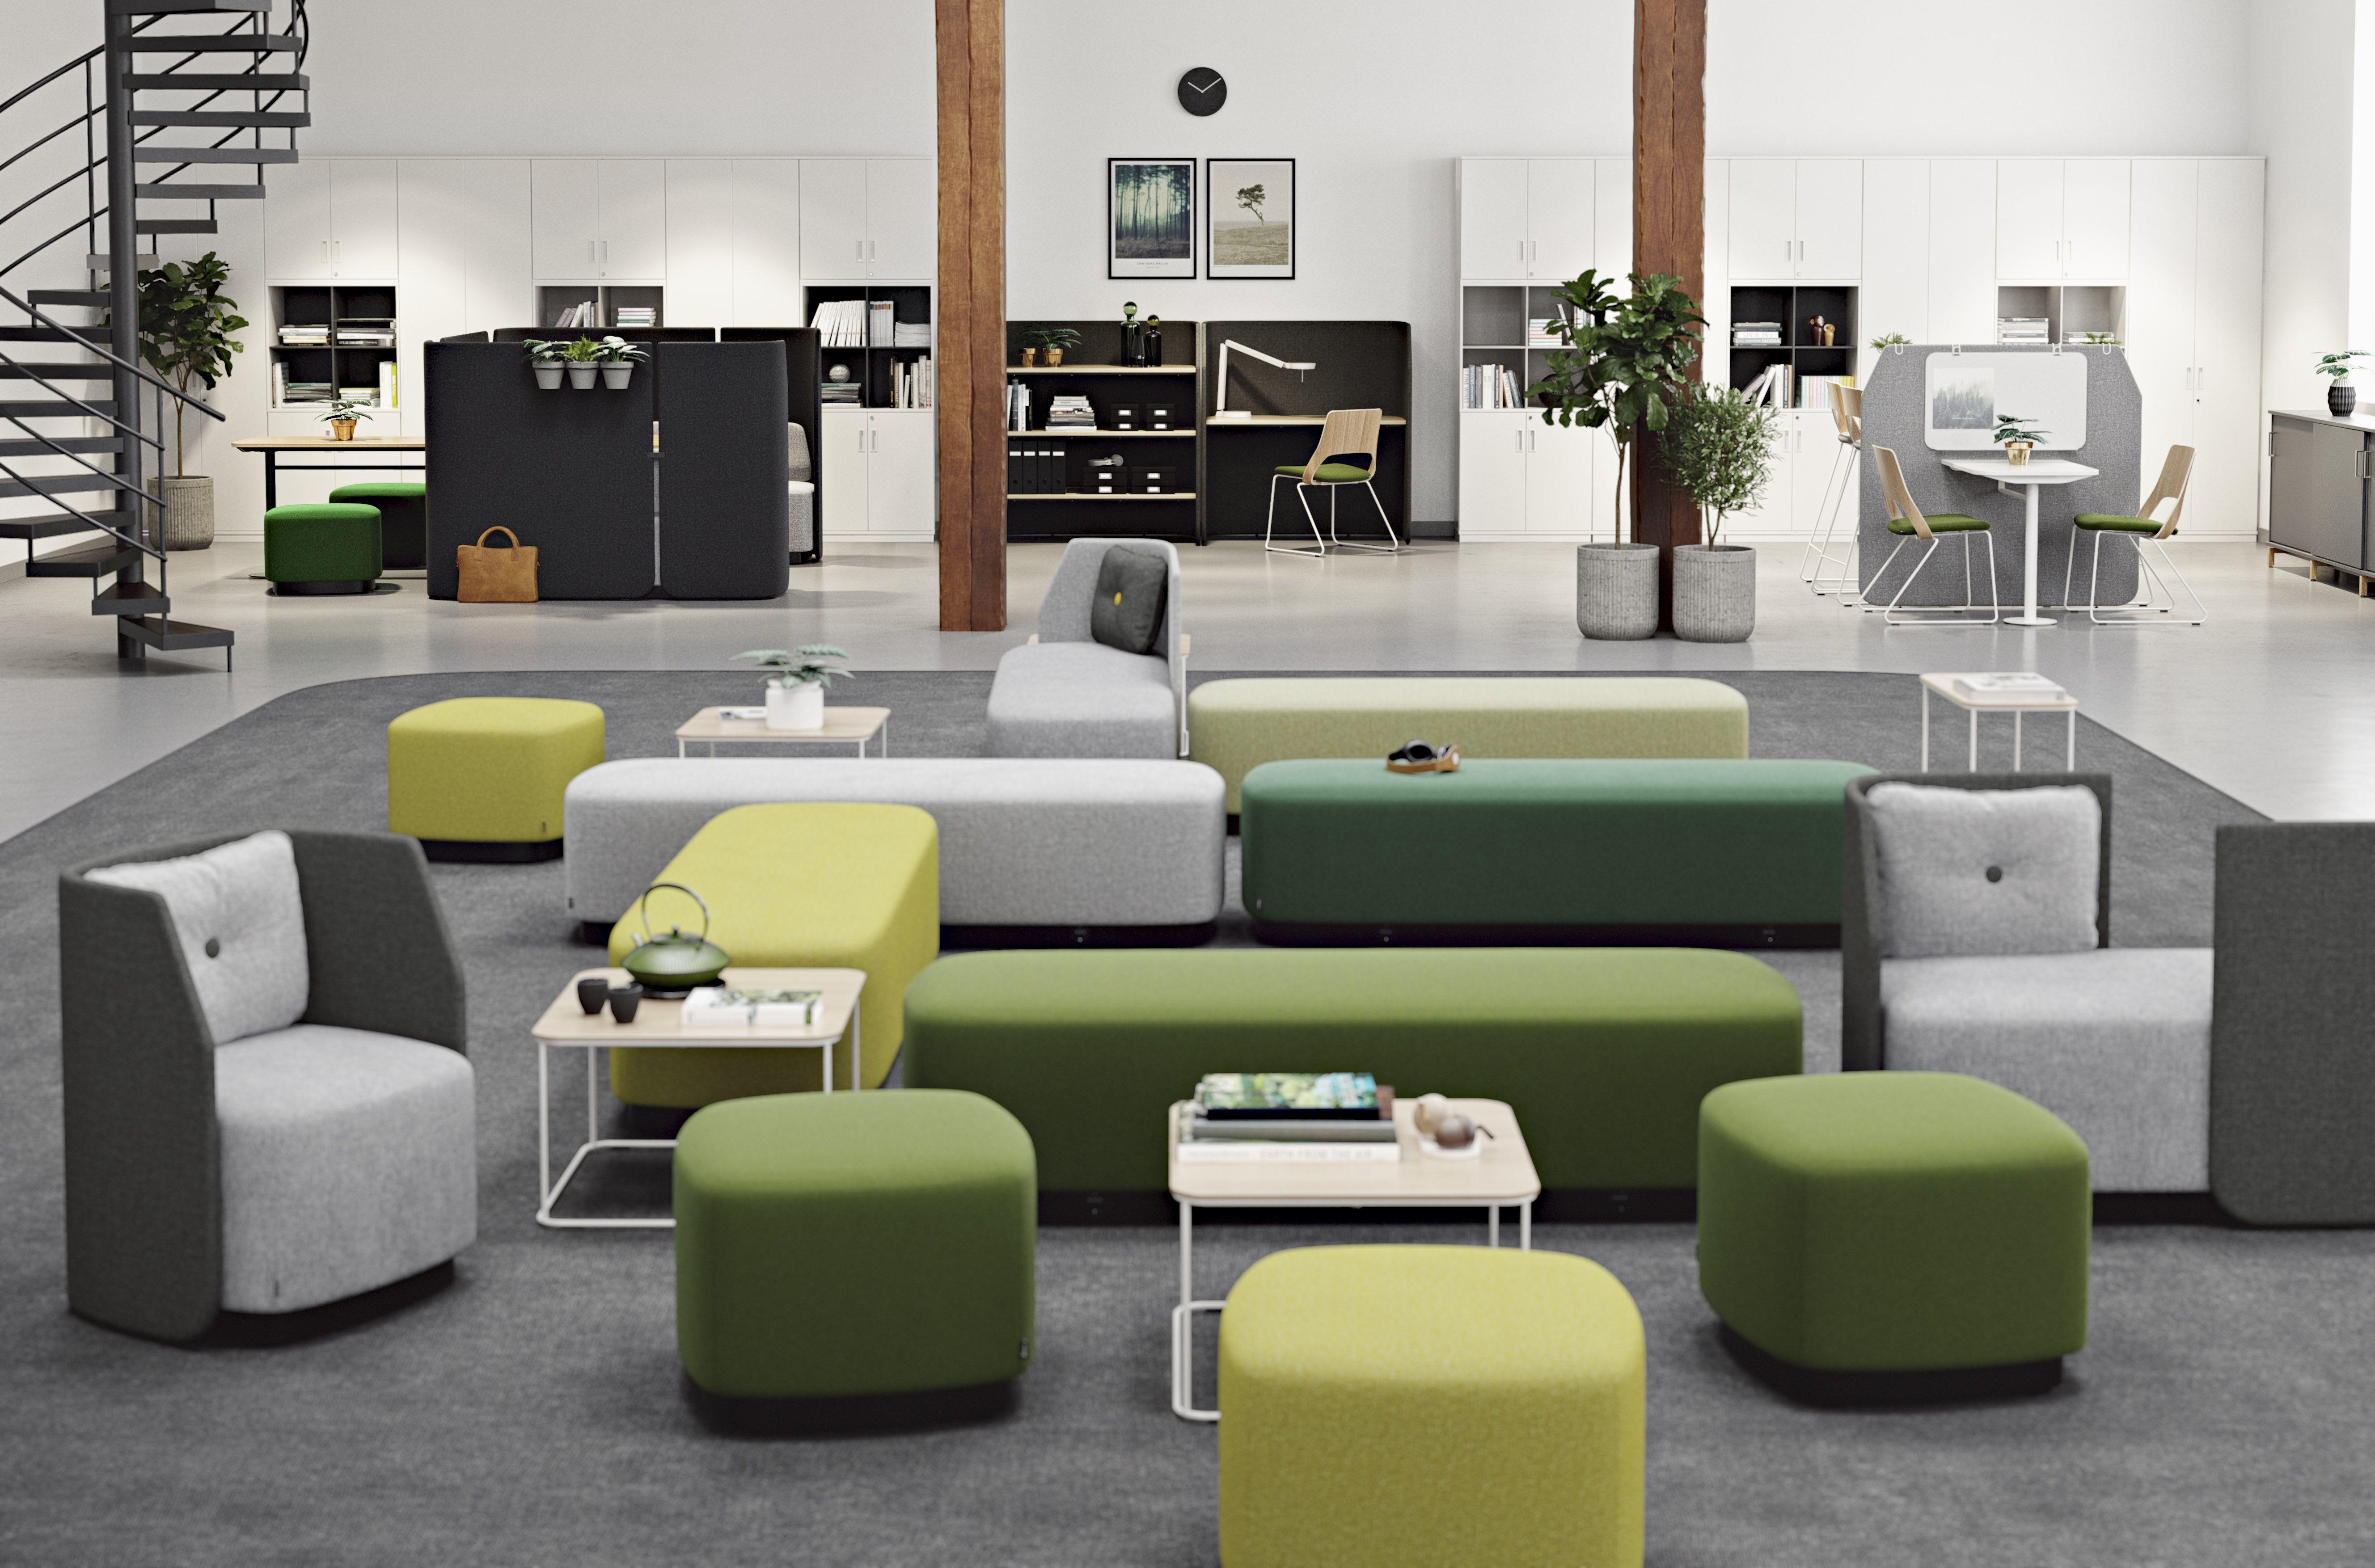 Fields - Sitzmöbel - Produkte - Kinnarps | OFFICE_DESIGN | Pinterest